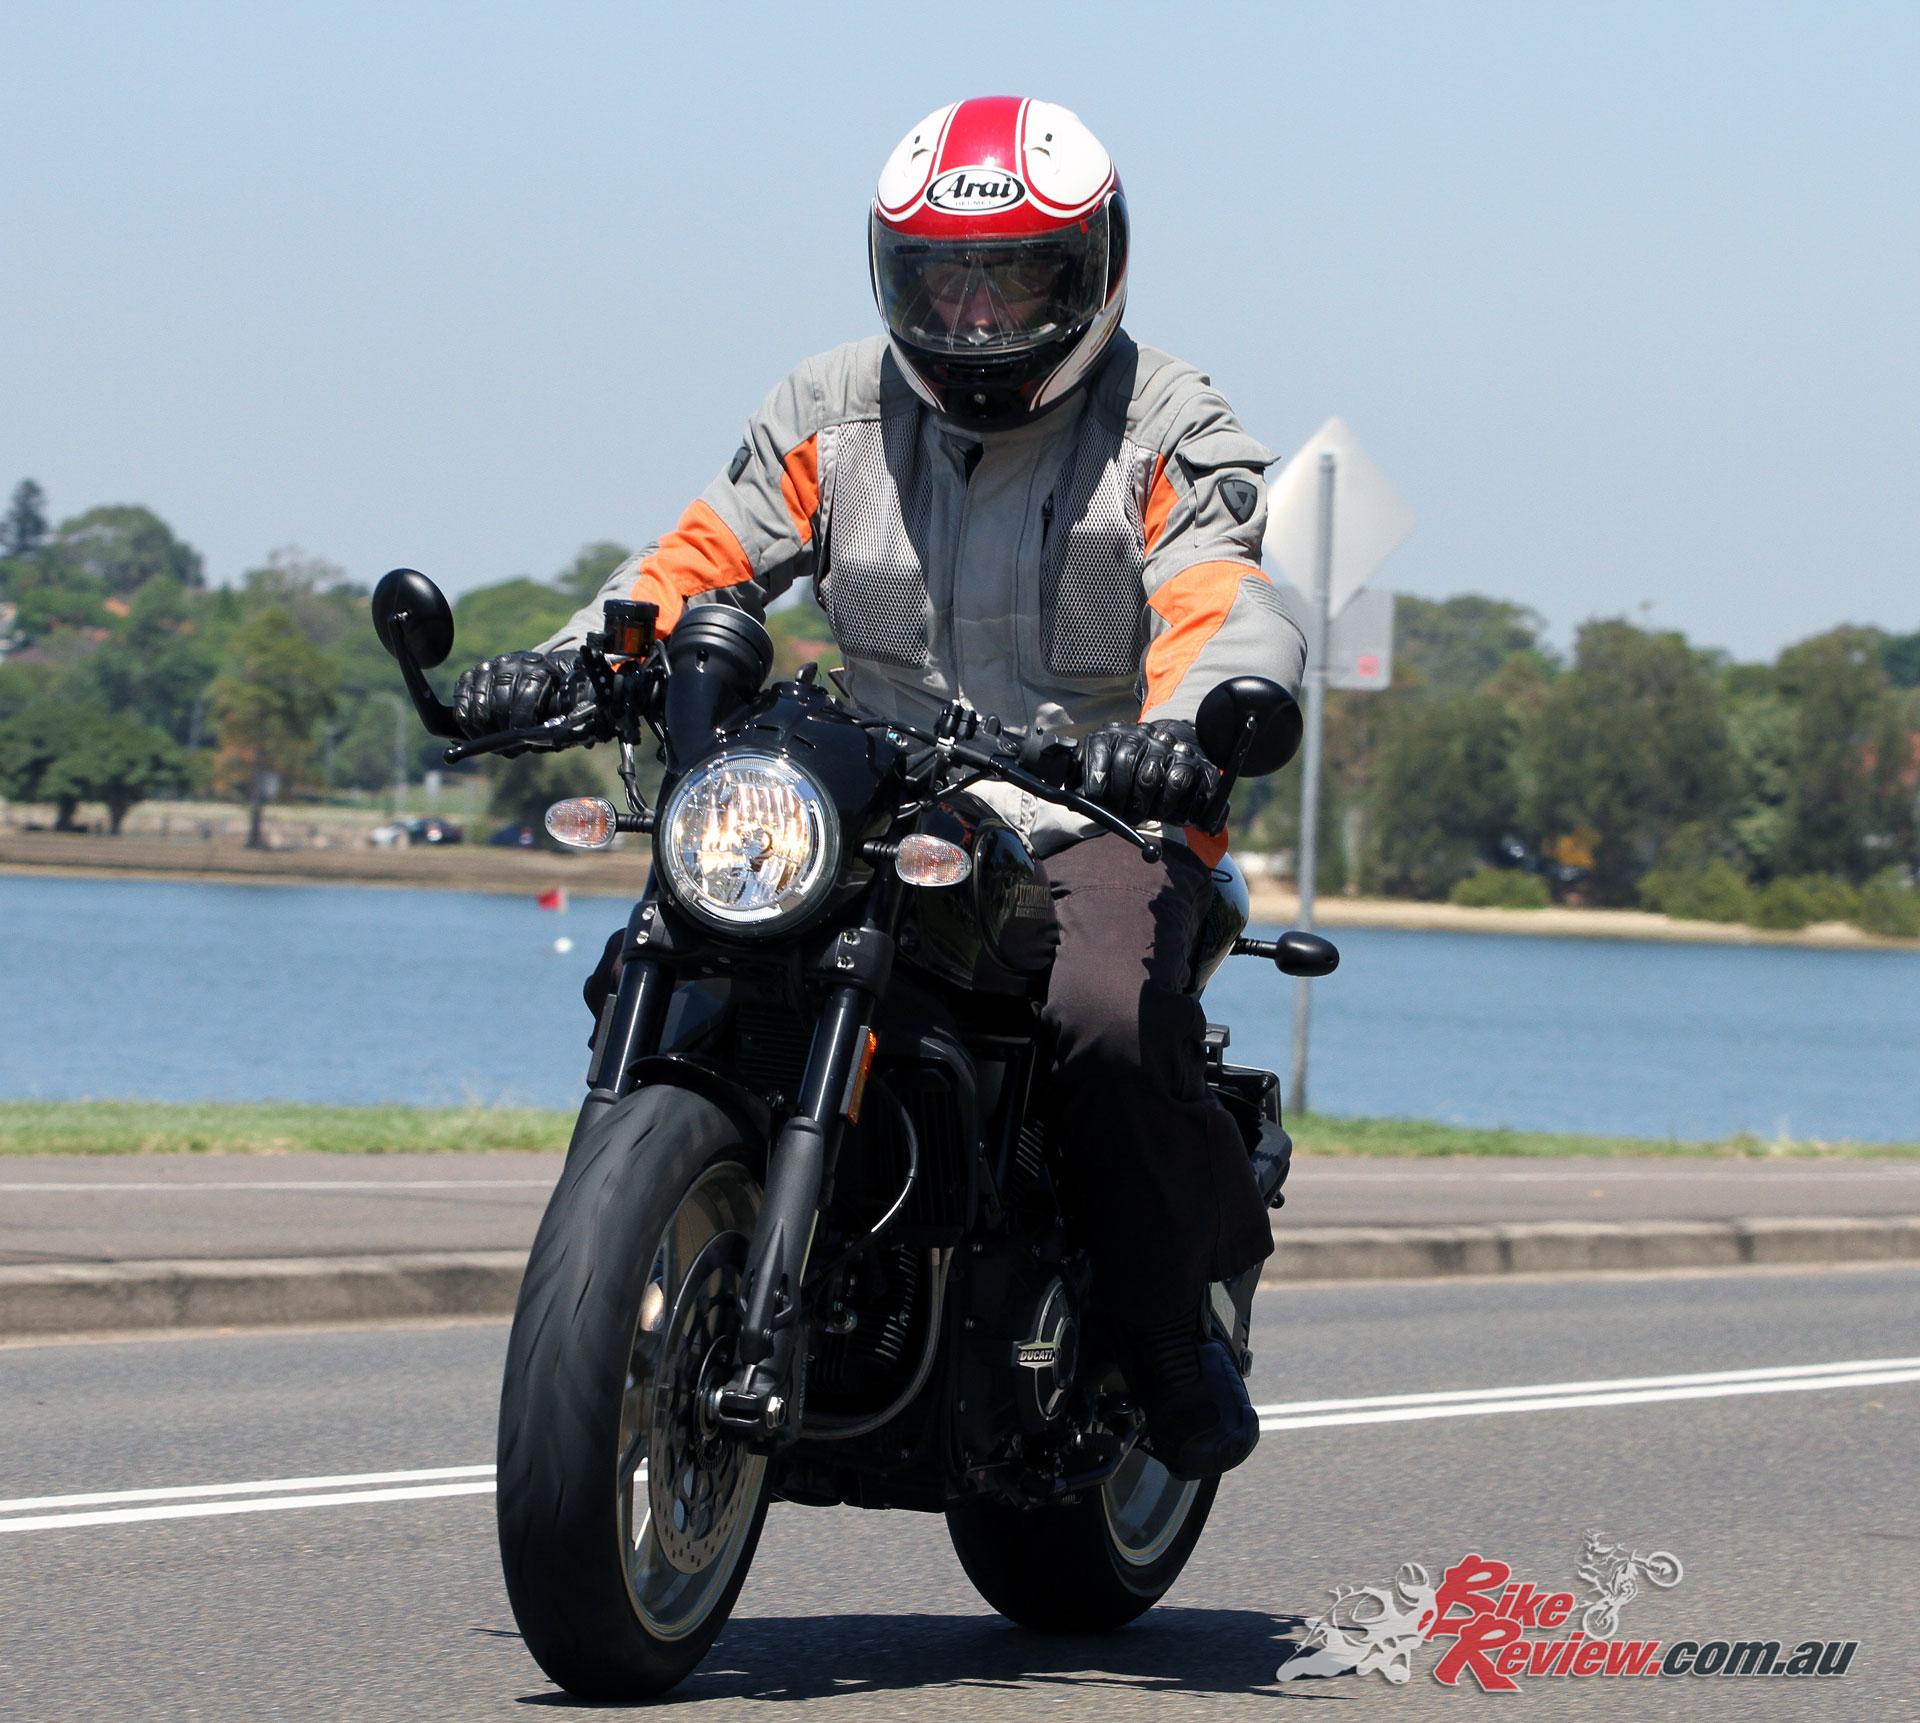 2018 Ducati Scrambler Icon Seat Height